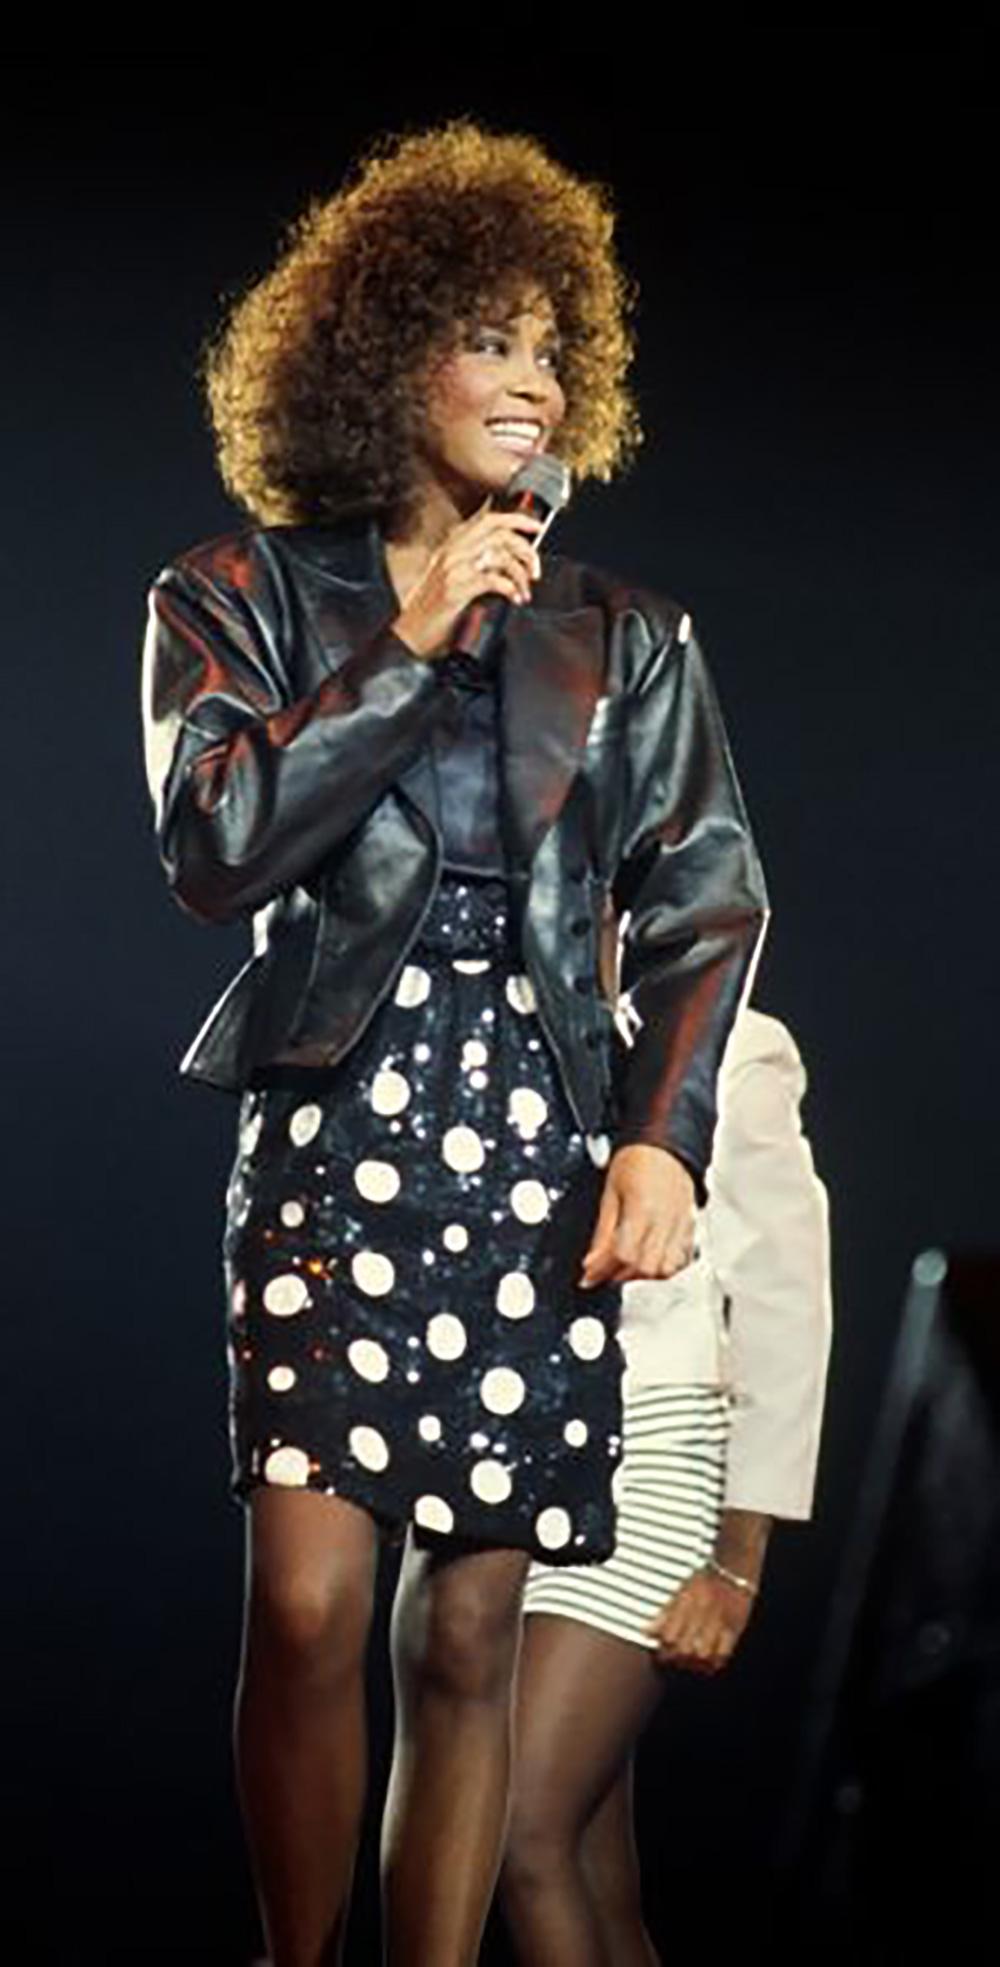 Whitney Houston in concert London, UK 1988 Moment of Truth World Tour